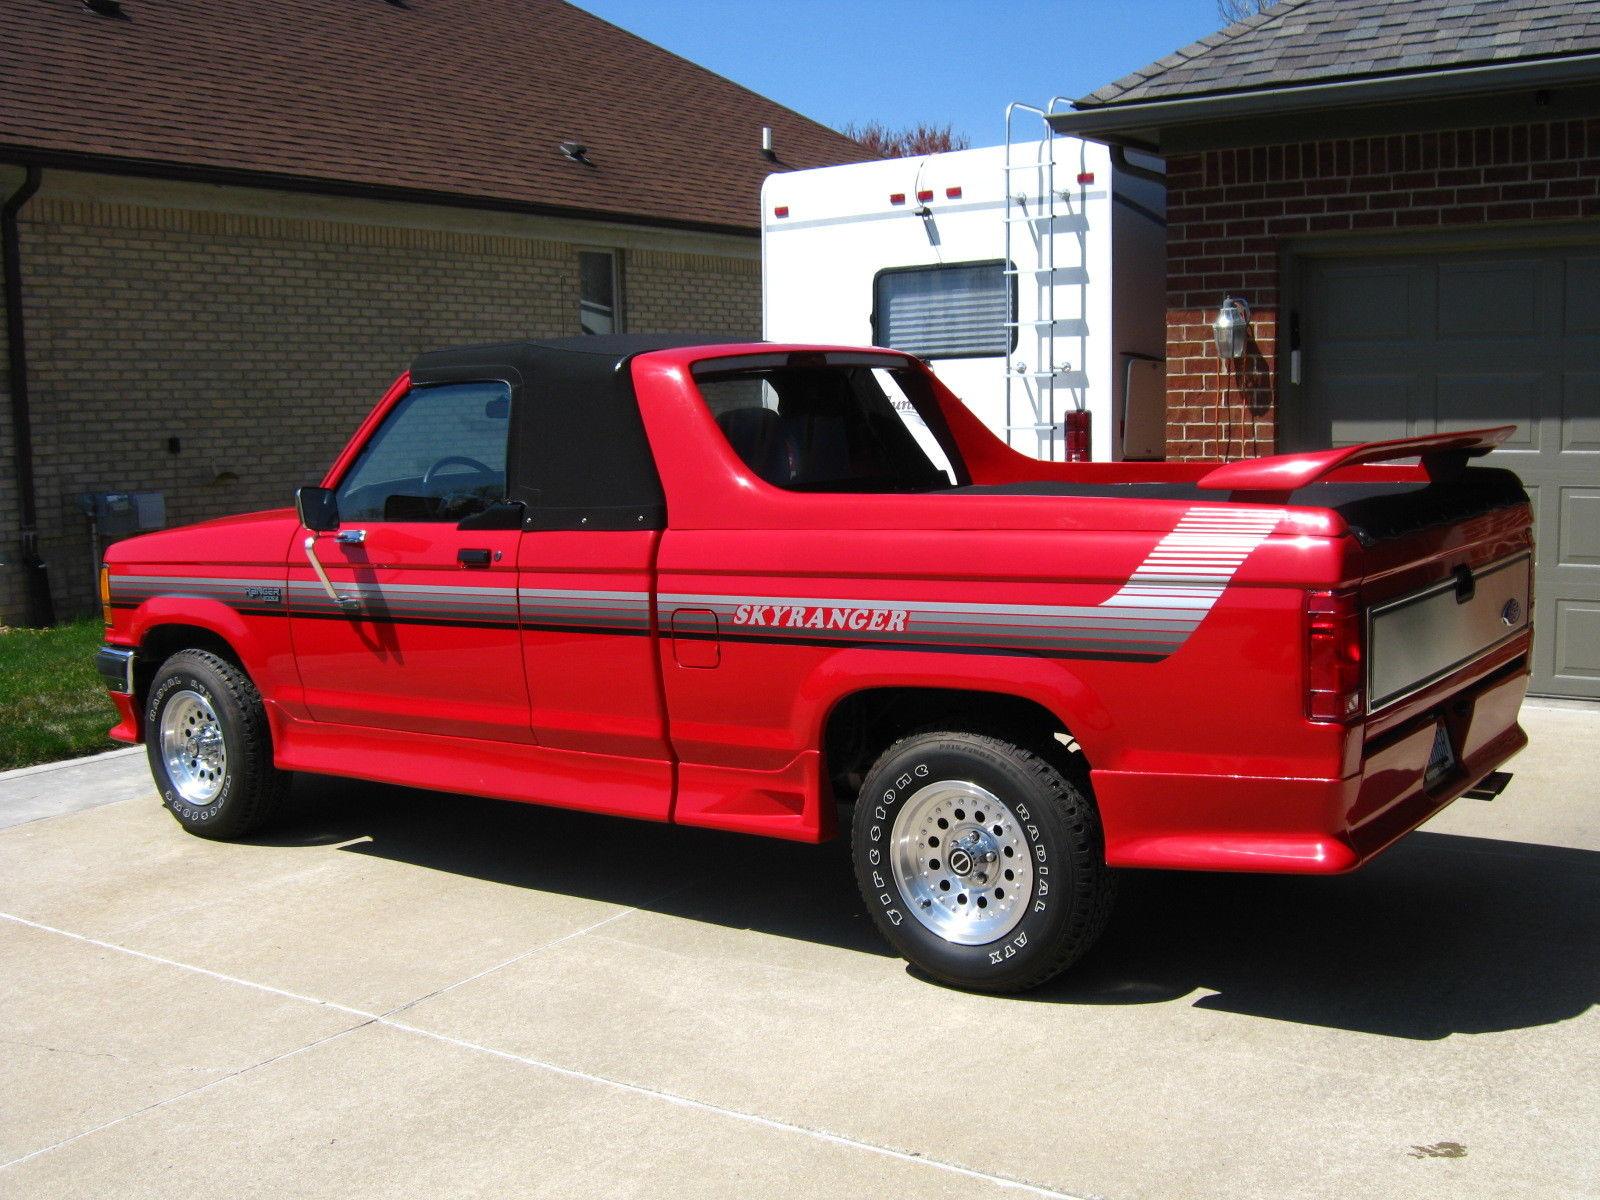 This Ford Skyranger Convertible Is A Rare Pickup Truck Photo Gallery on 1989 Dodge Dakota Steering Column